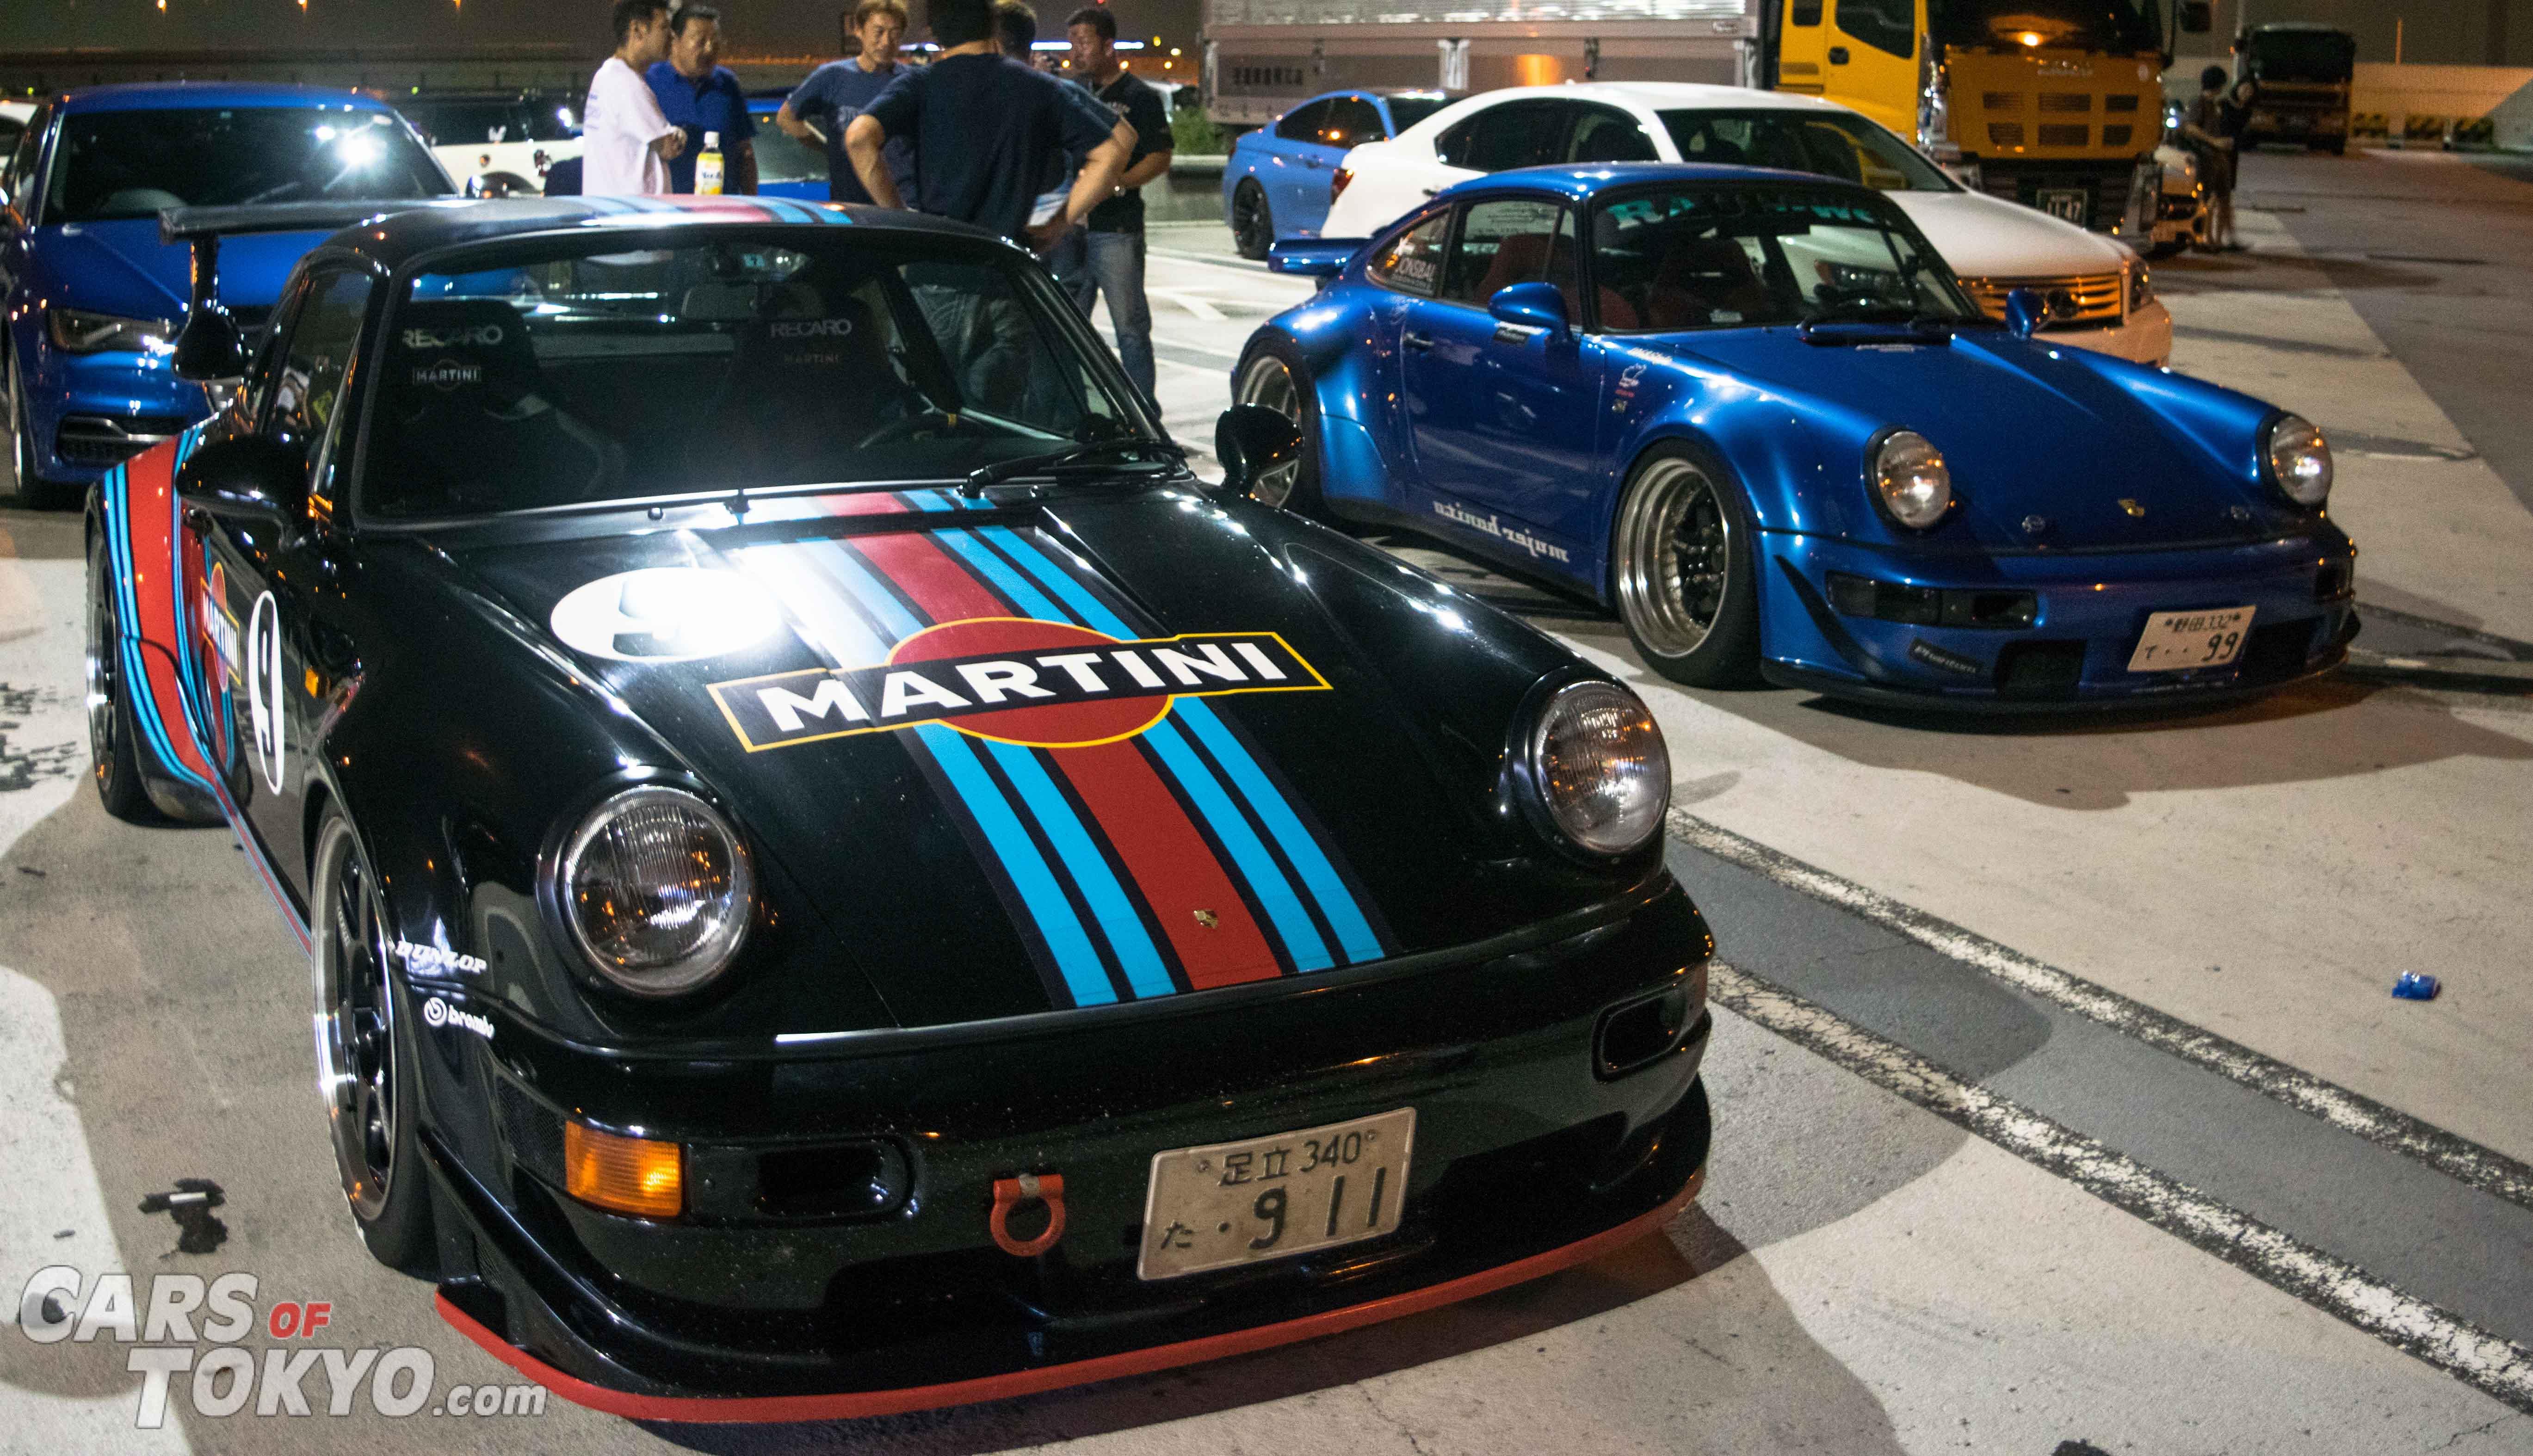 Cars of Tokyo Tatsumi 911 RWB & Martini